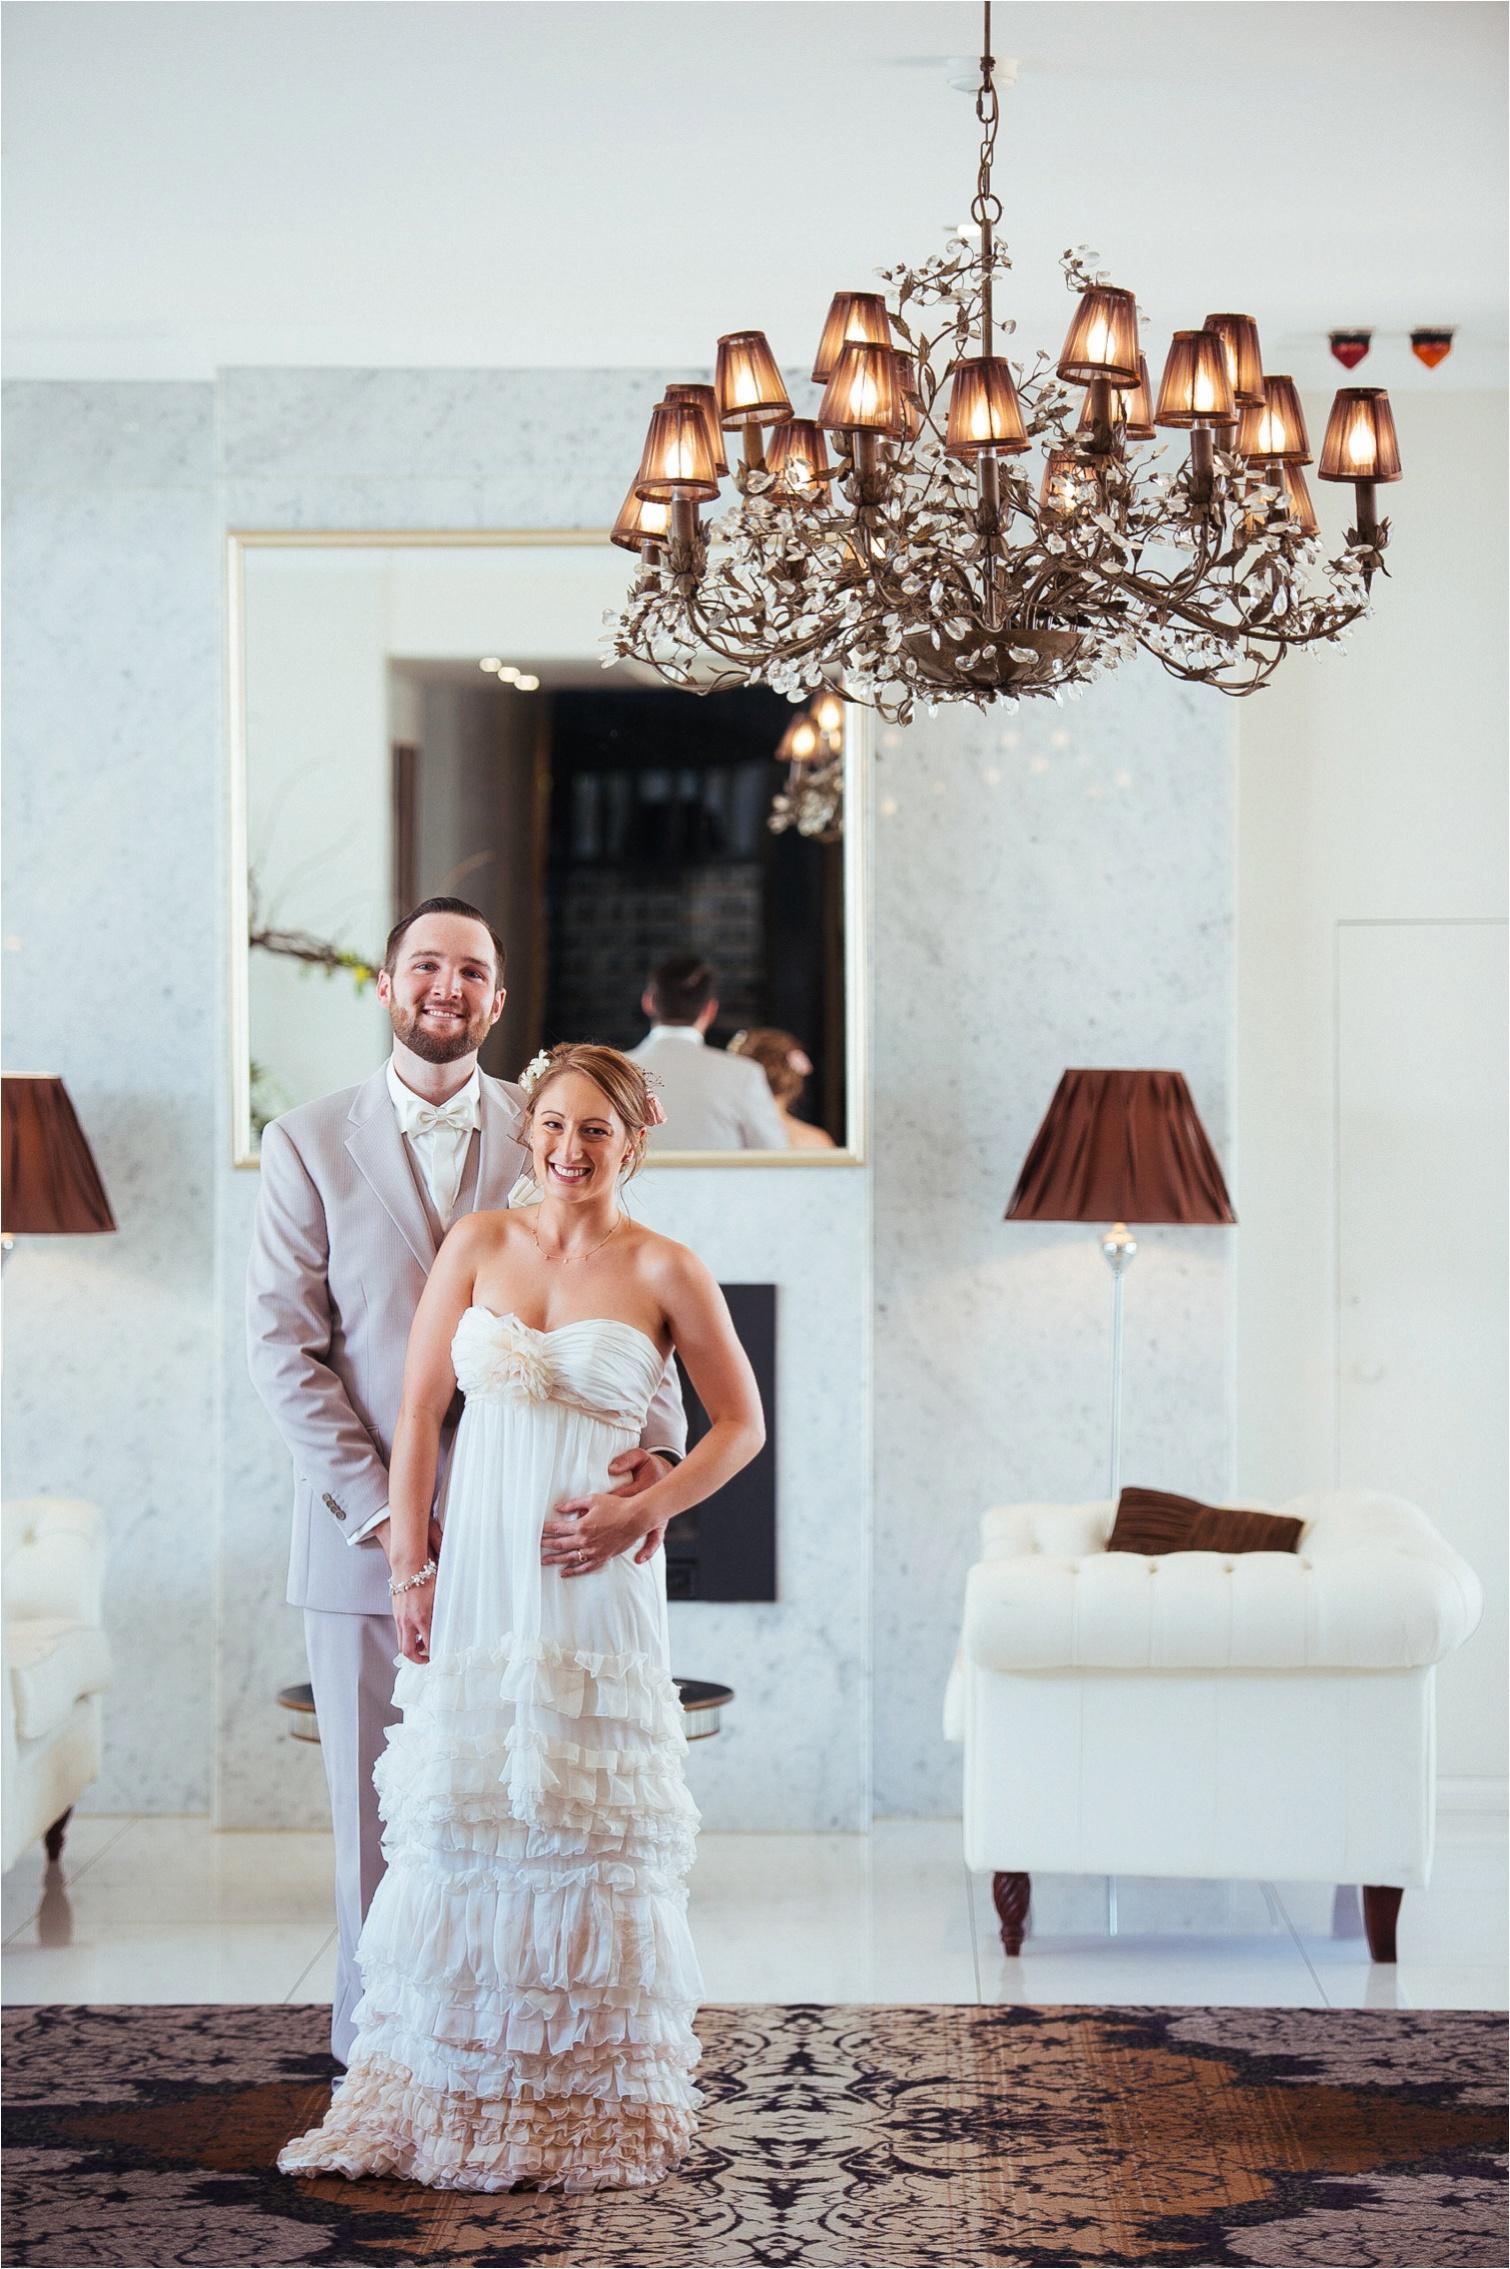 Jenny&Mitch_Sebel_Windsor_Sydney_Polo_Club_wedding-by_The_Follans_Gold_Coast_Wedding_Photographers_0039.jpg